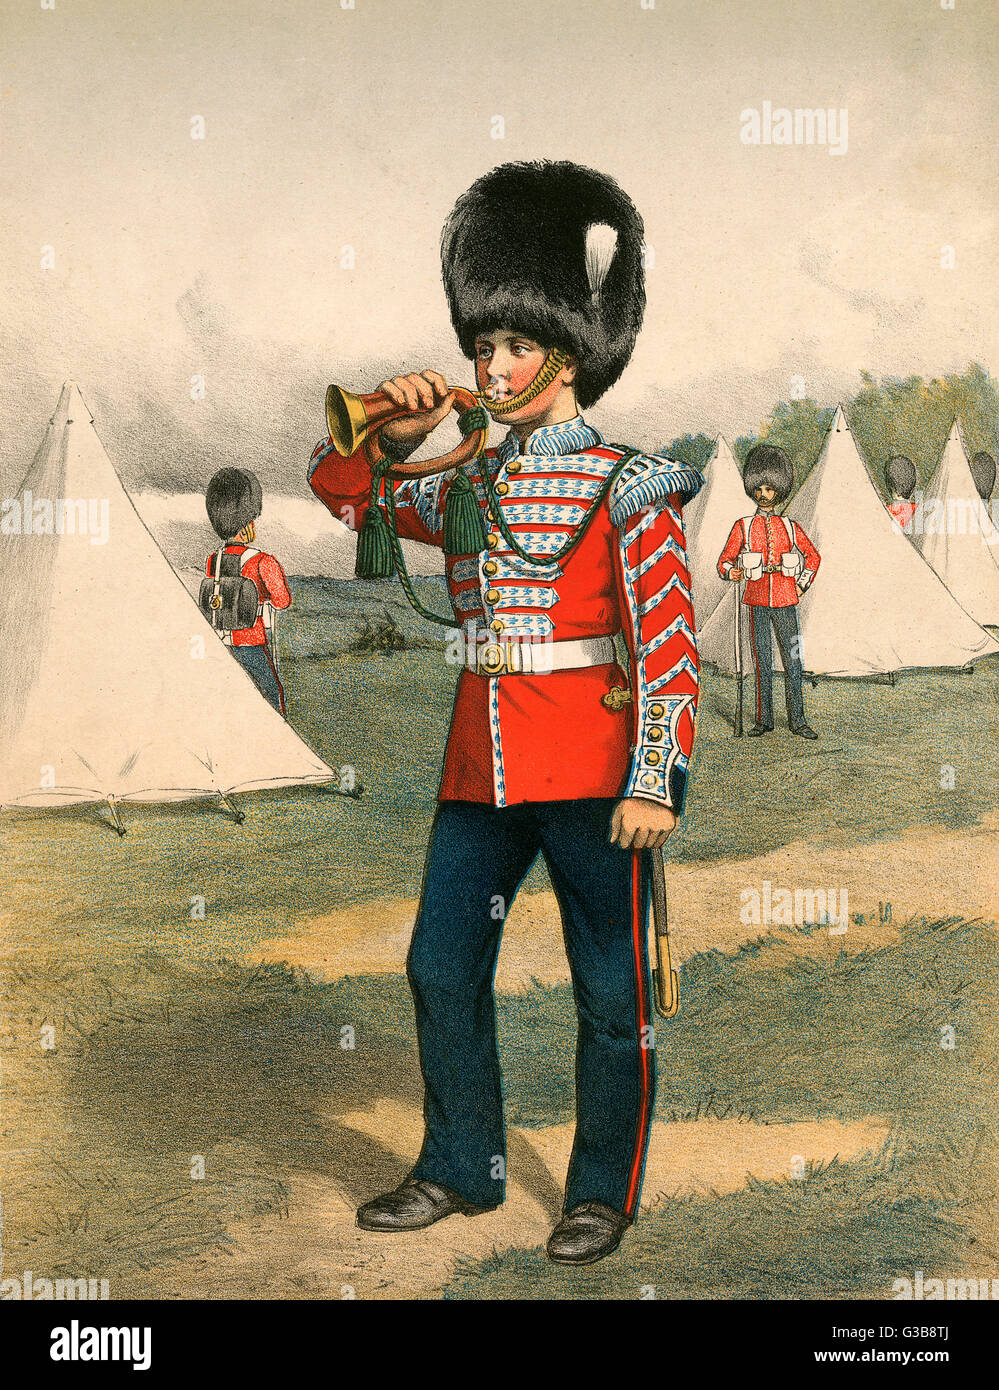 Un ejército bugler indigna a sus compañeros en un campamento militar. Fecha: circa 1870 Imagen De Stock